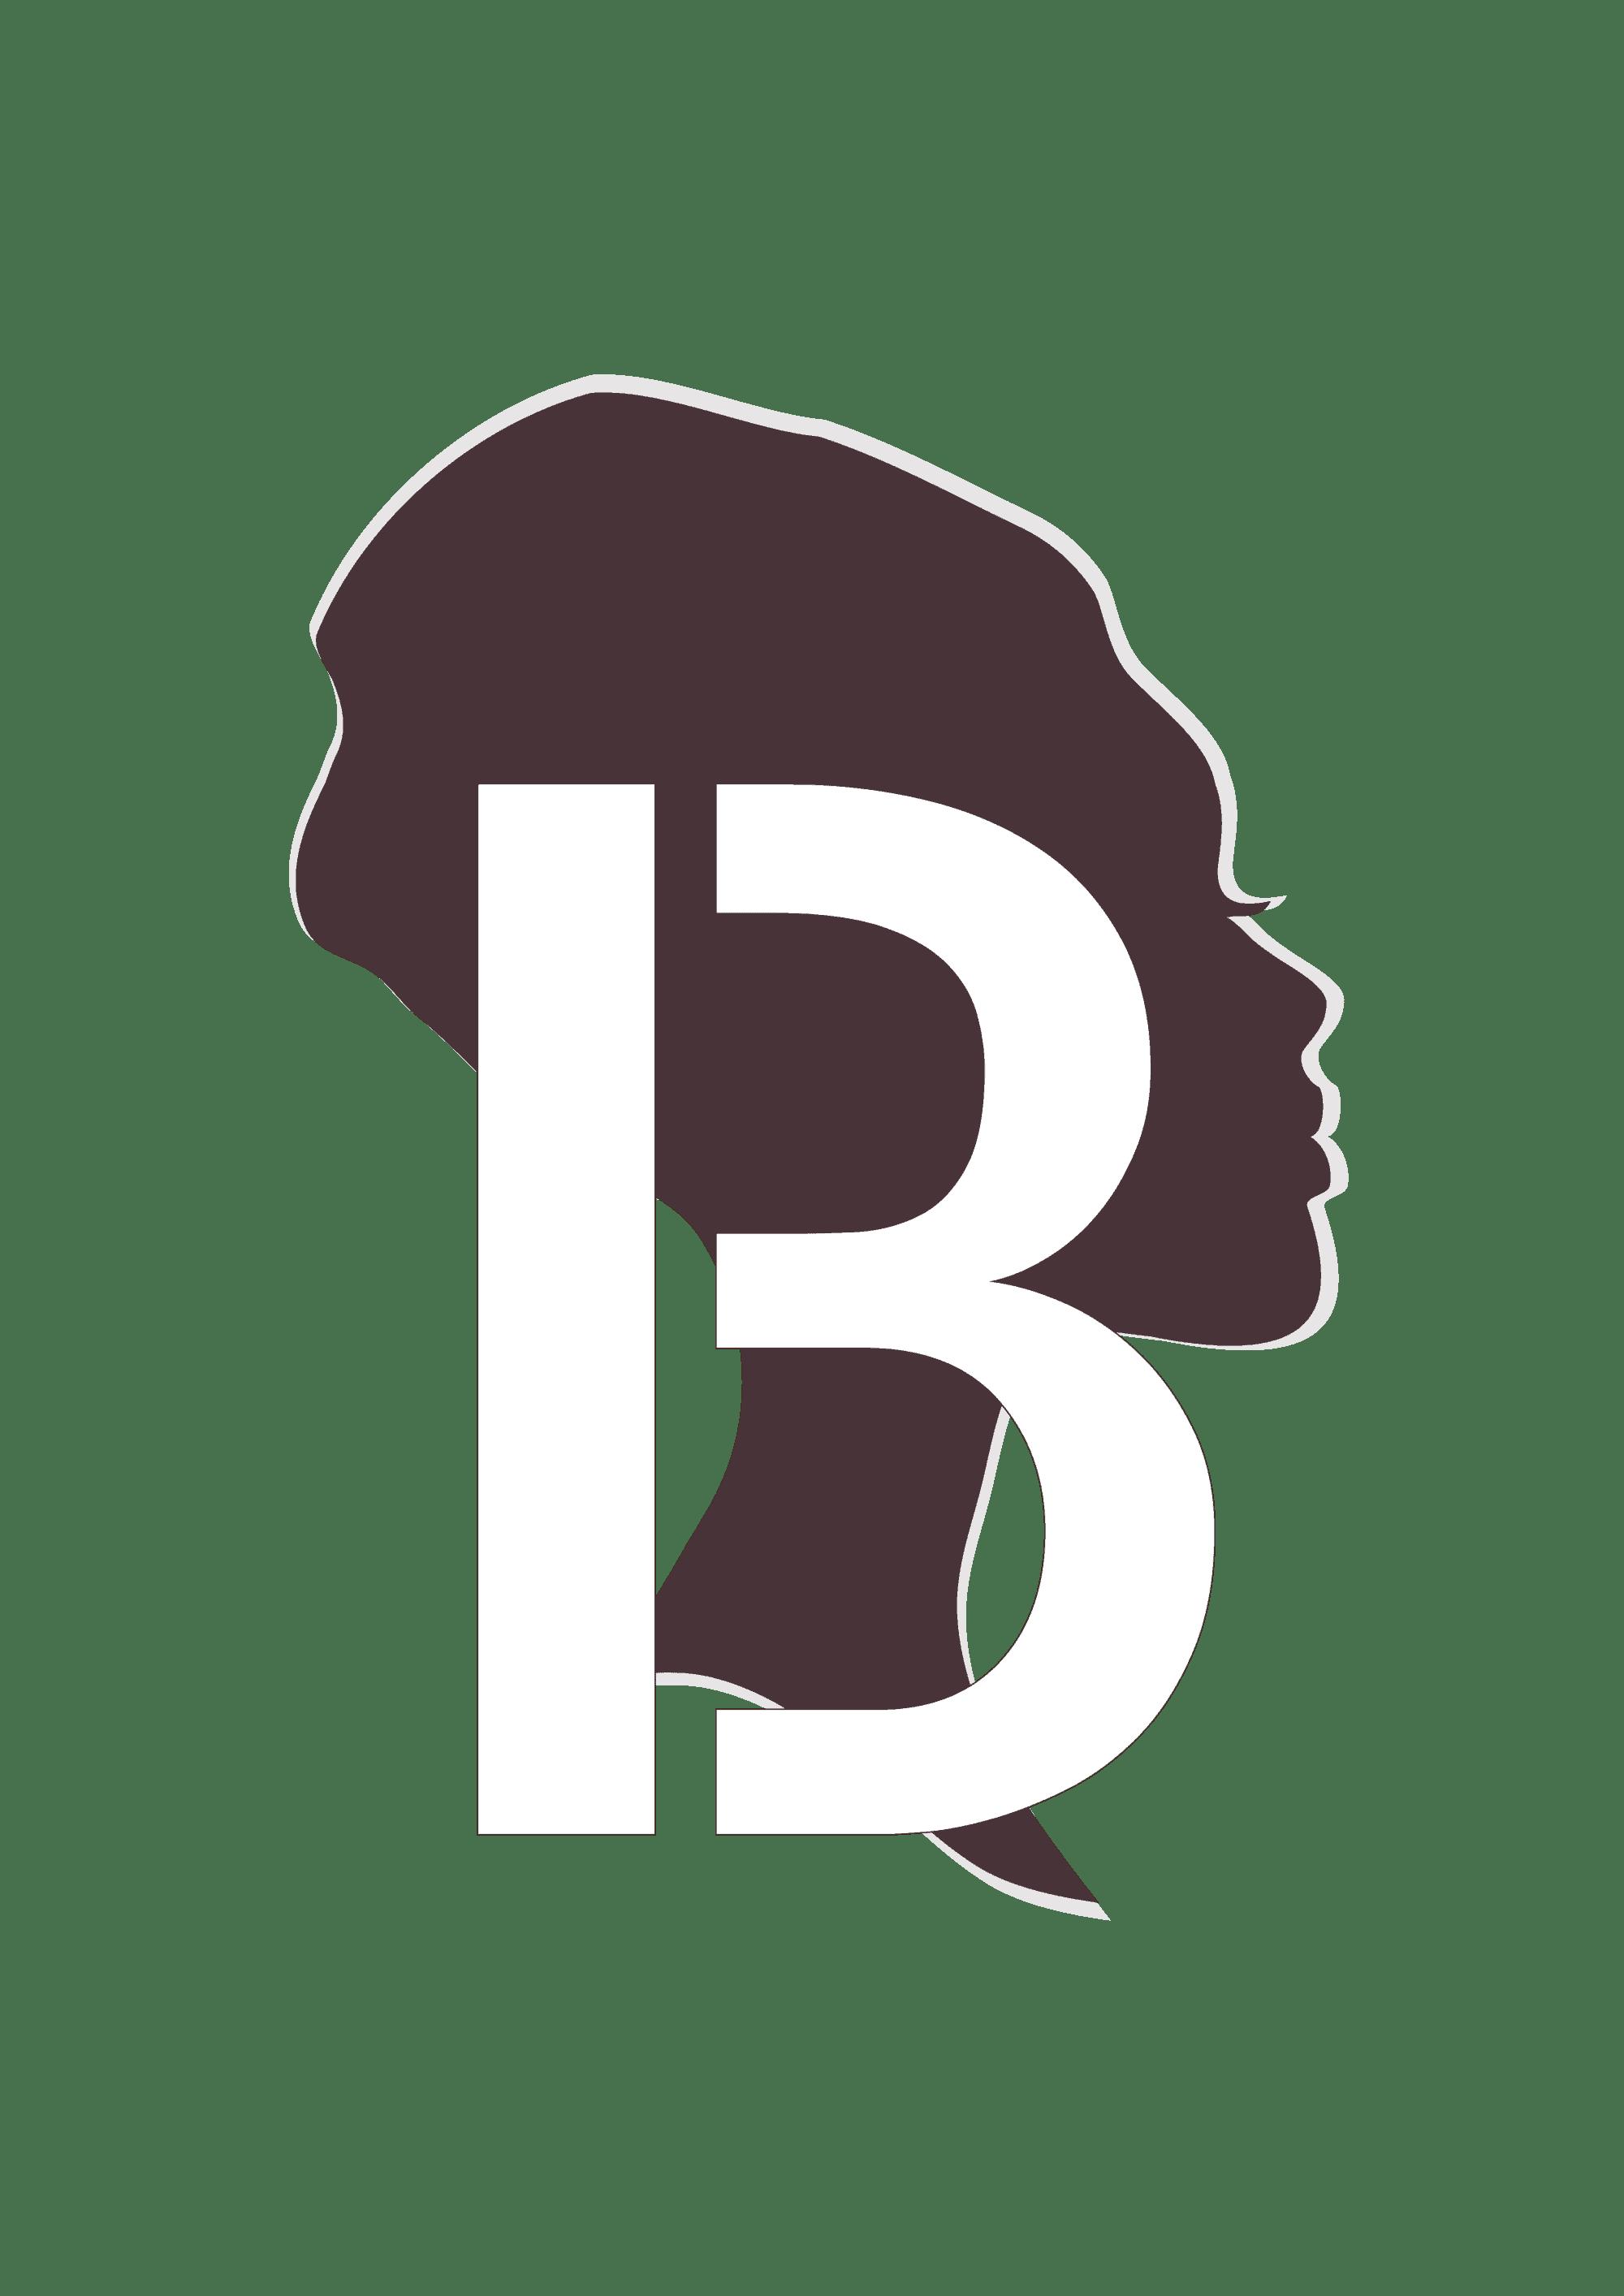 Het Bèkske, vrouwen, rwandese koffie, specialty koffie, empower, Rwanda